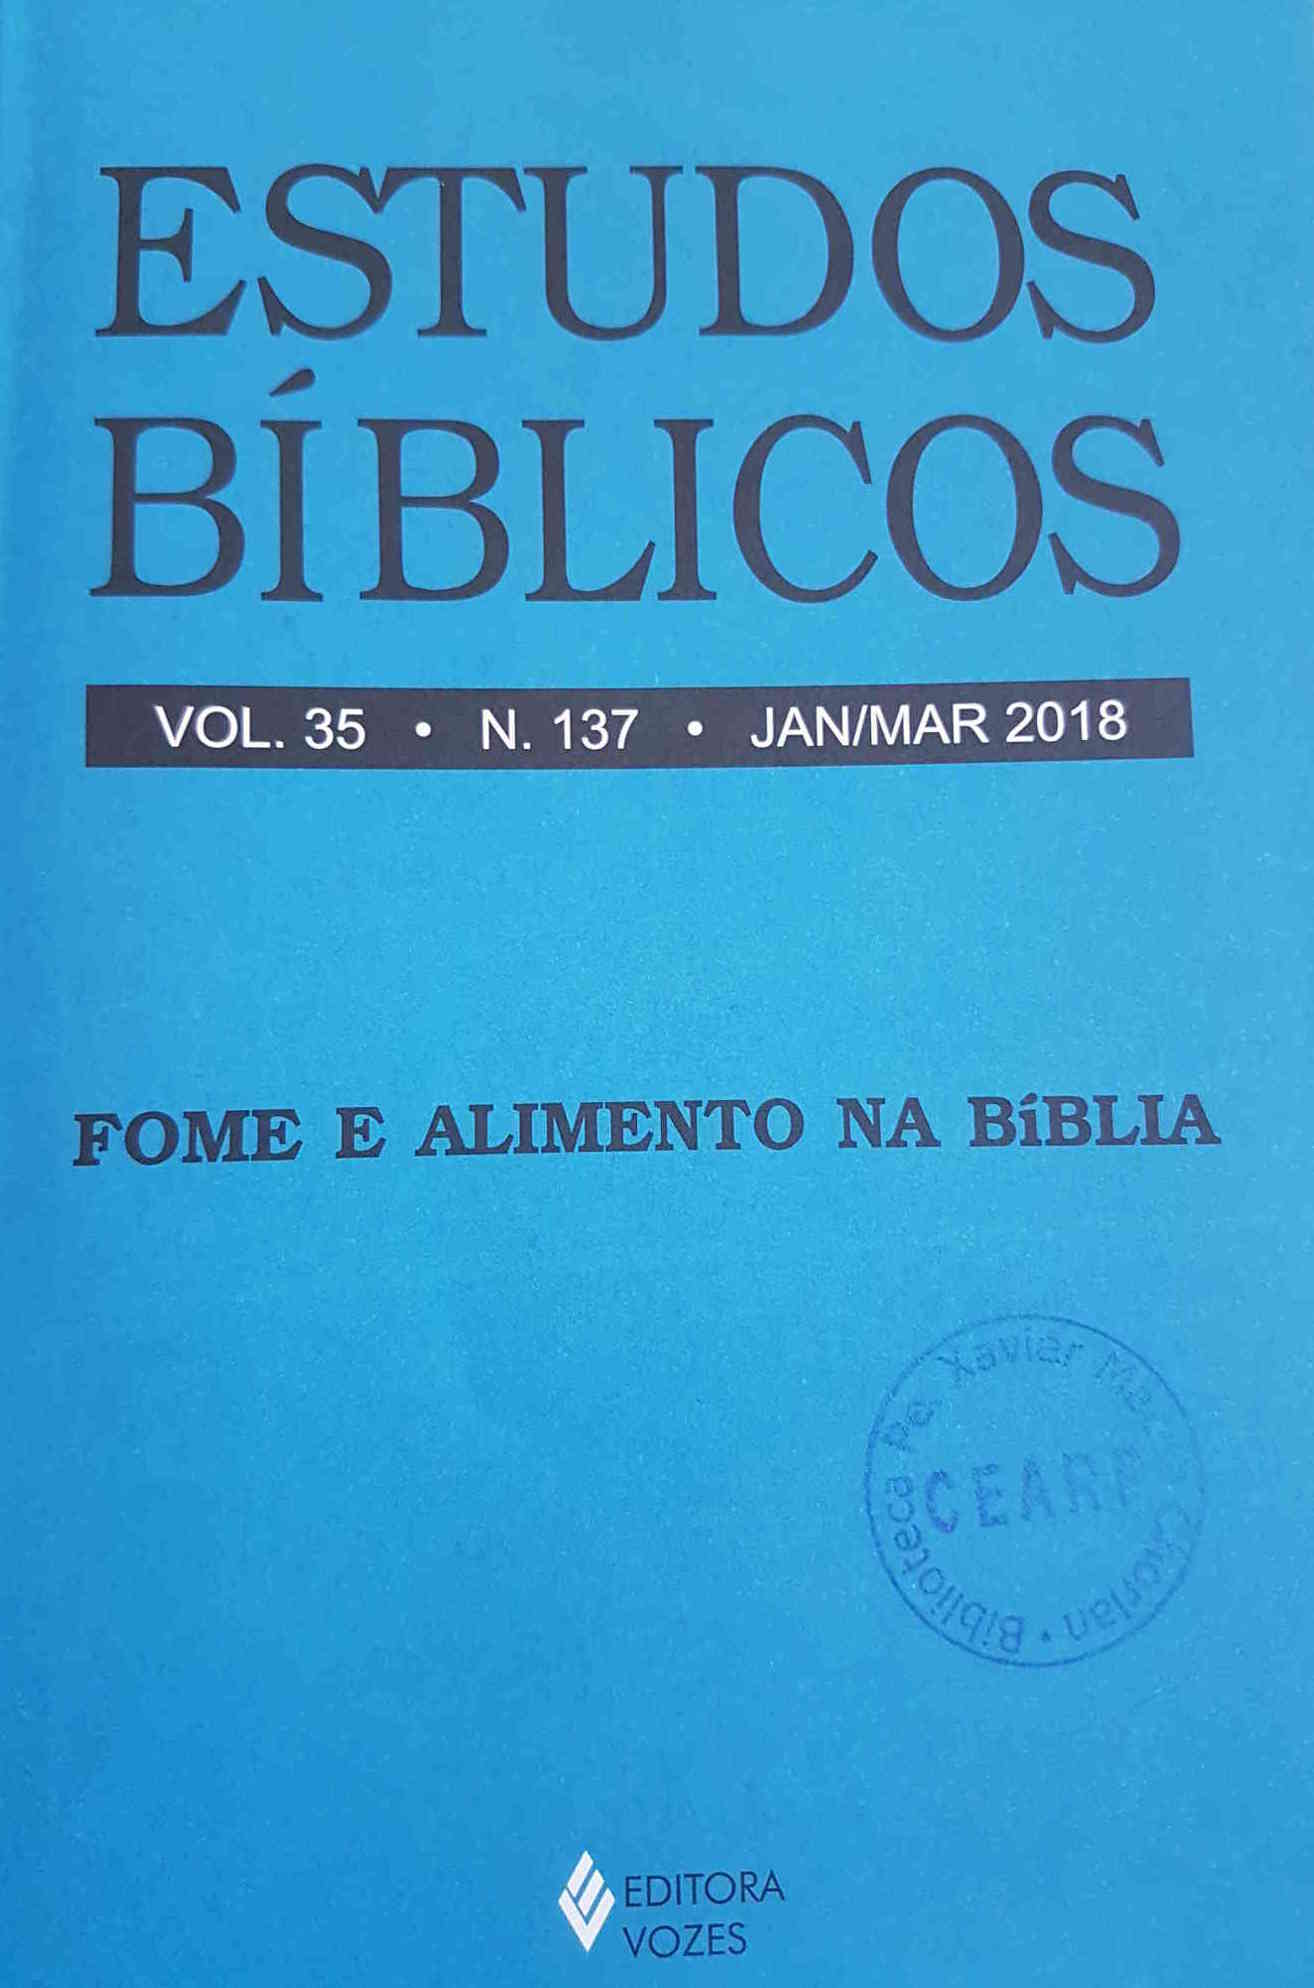 Fome e alimento na Bíblia - Estudos Bíblicos 137, Jan/Mar 2018